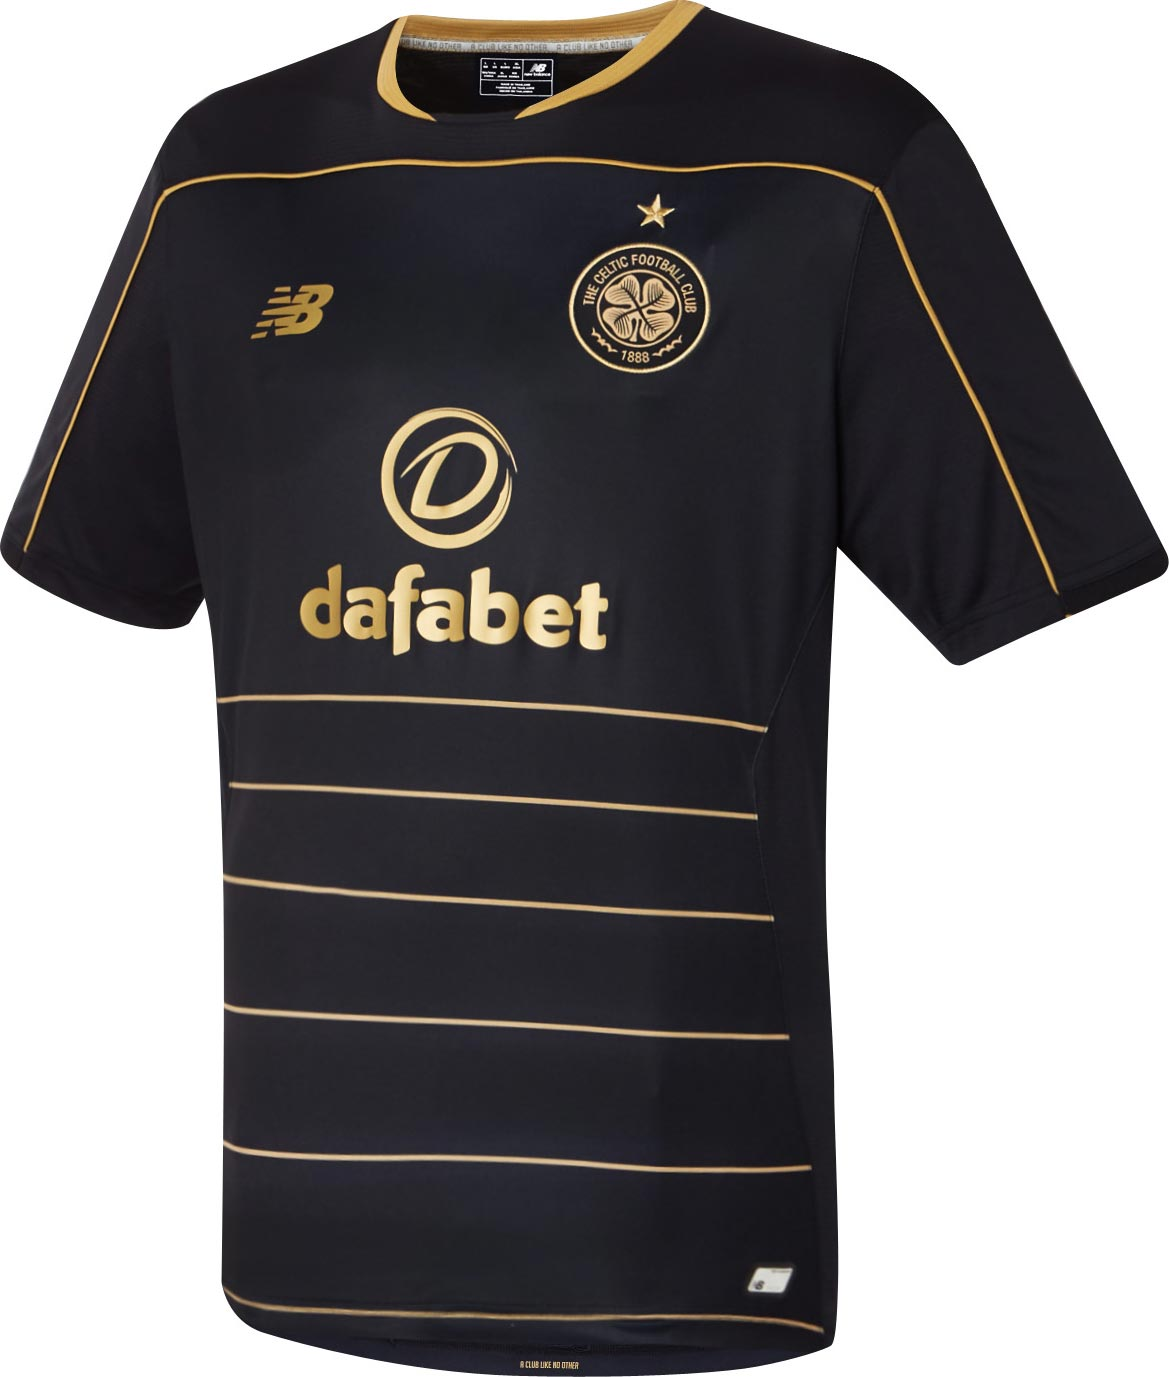 31fa6eeebea Celtic 2016-17 Away Kit Revealed